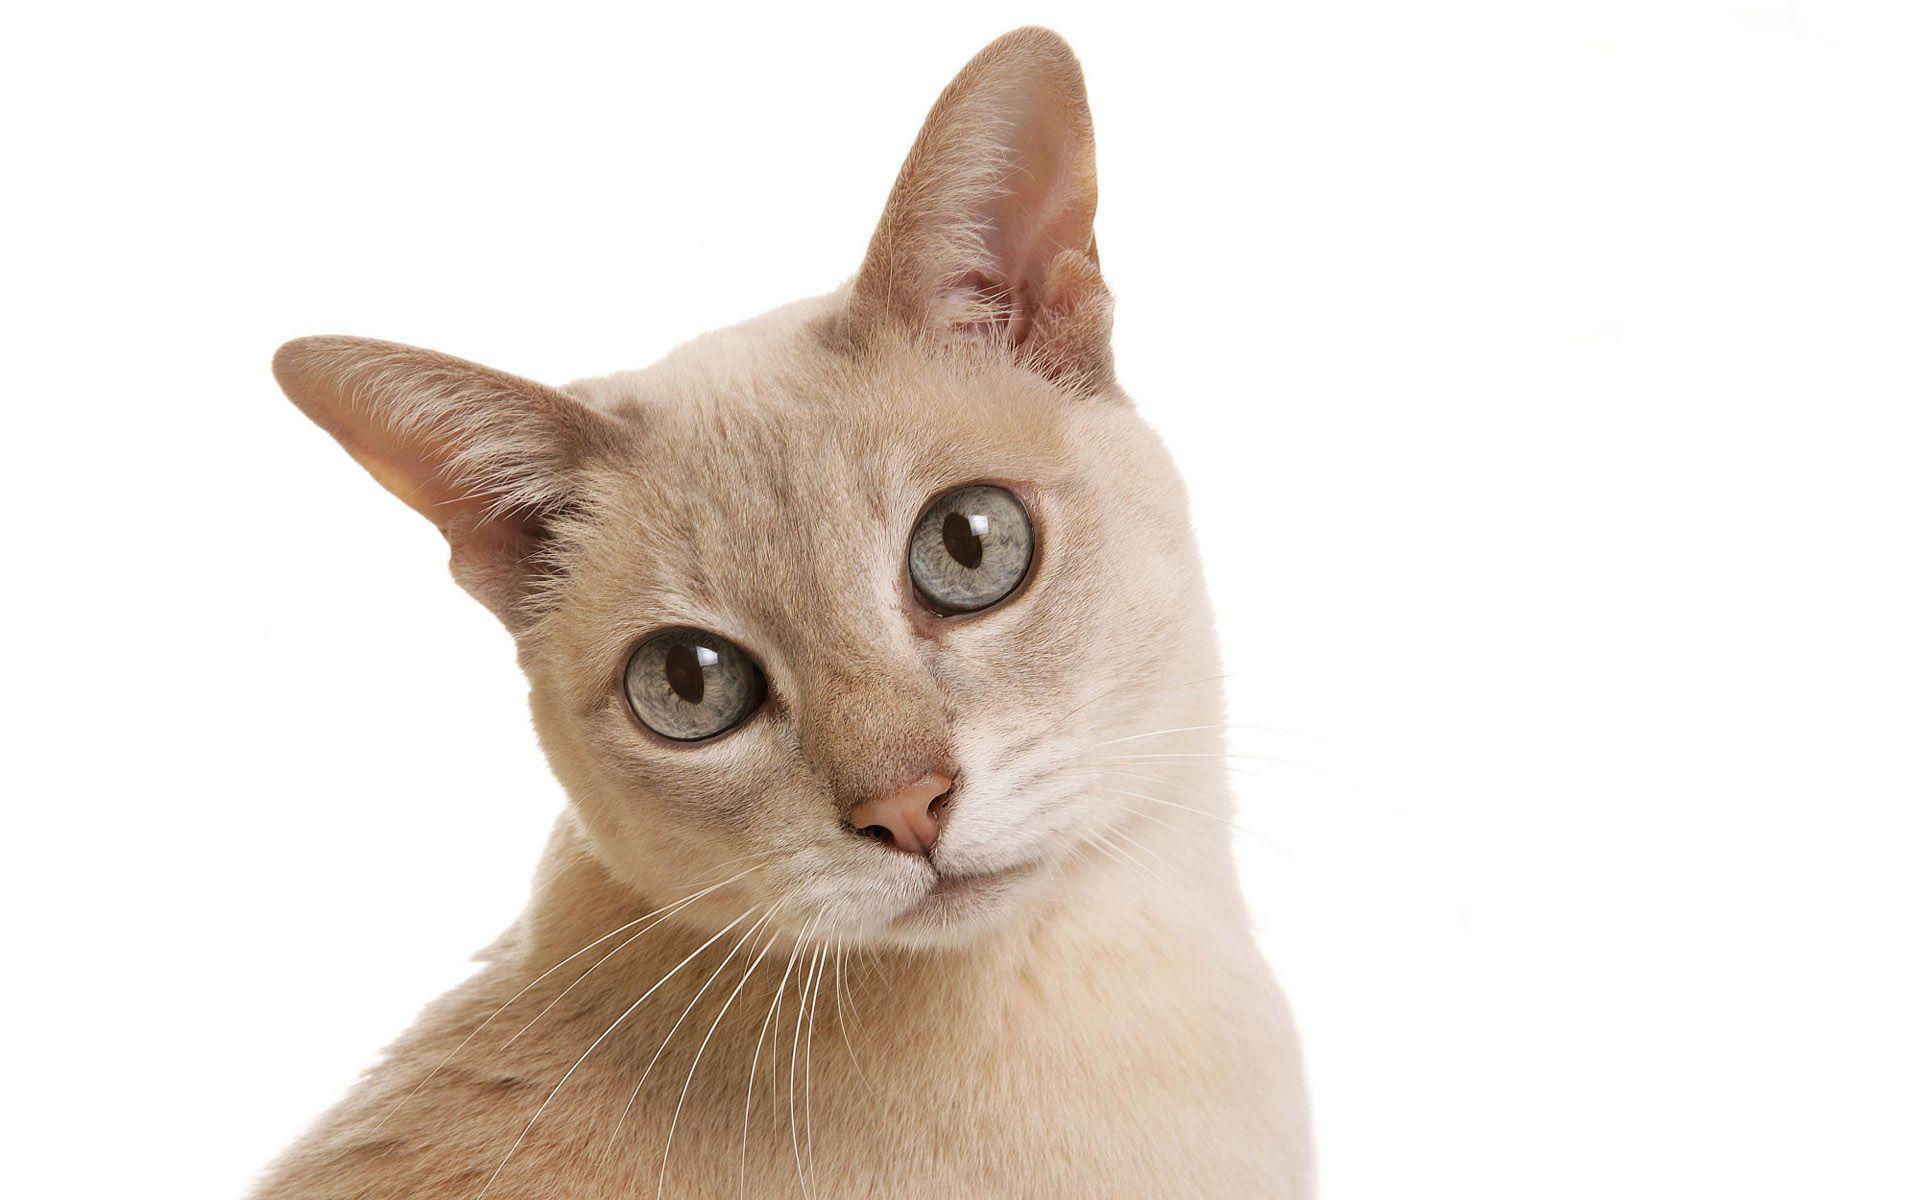 White Cat, Black Face, White Background   Flickr - Photo ...  White Cats Blue Background